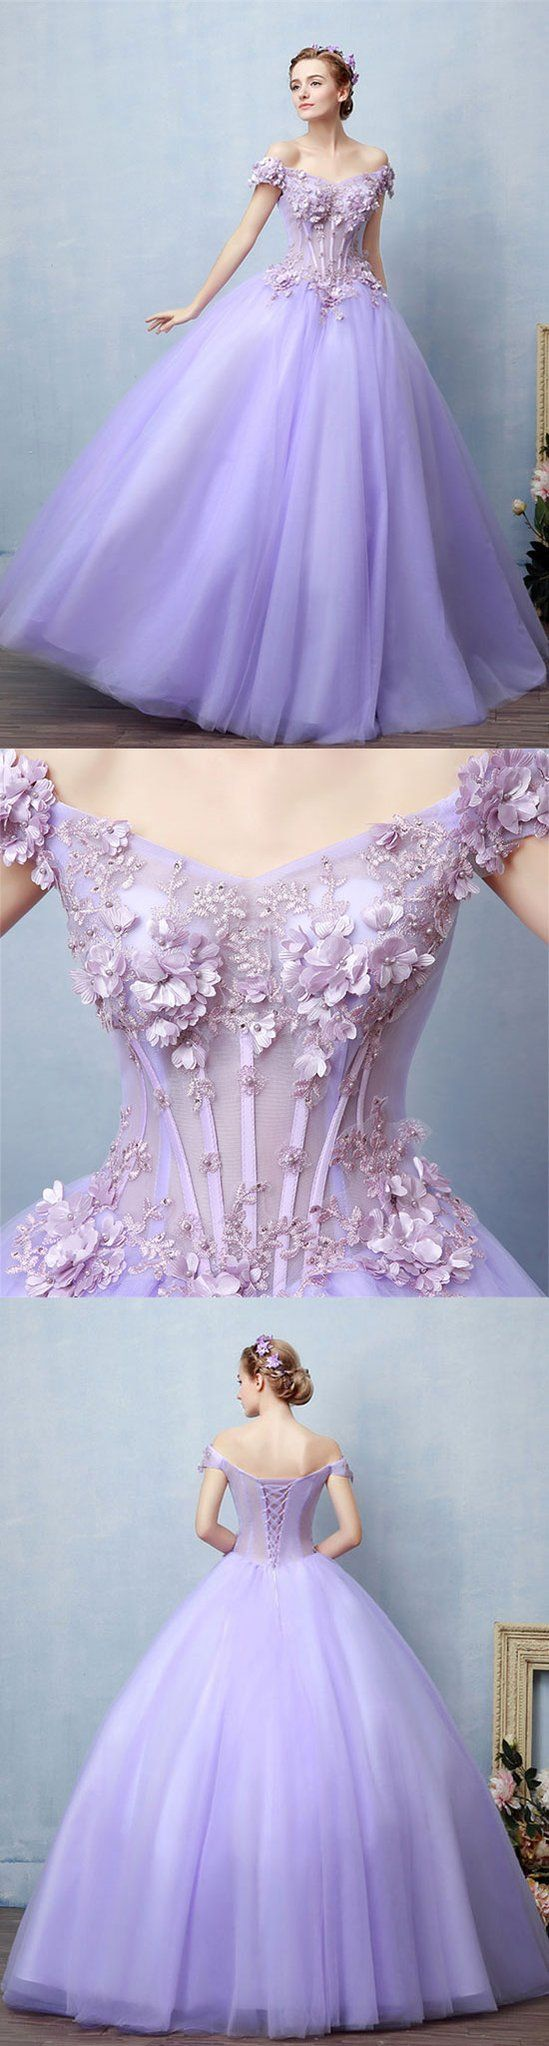 Light Purple Tulle Lace Long Prom Dress Sweet 16 Dress Trendty Sweet 16 Dresses Prom Dresses Ball Gown Dresses [ 2046 x 549 Pixel ]